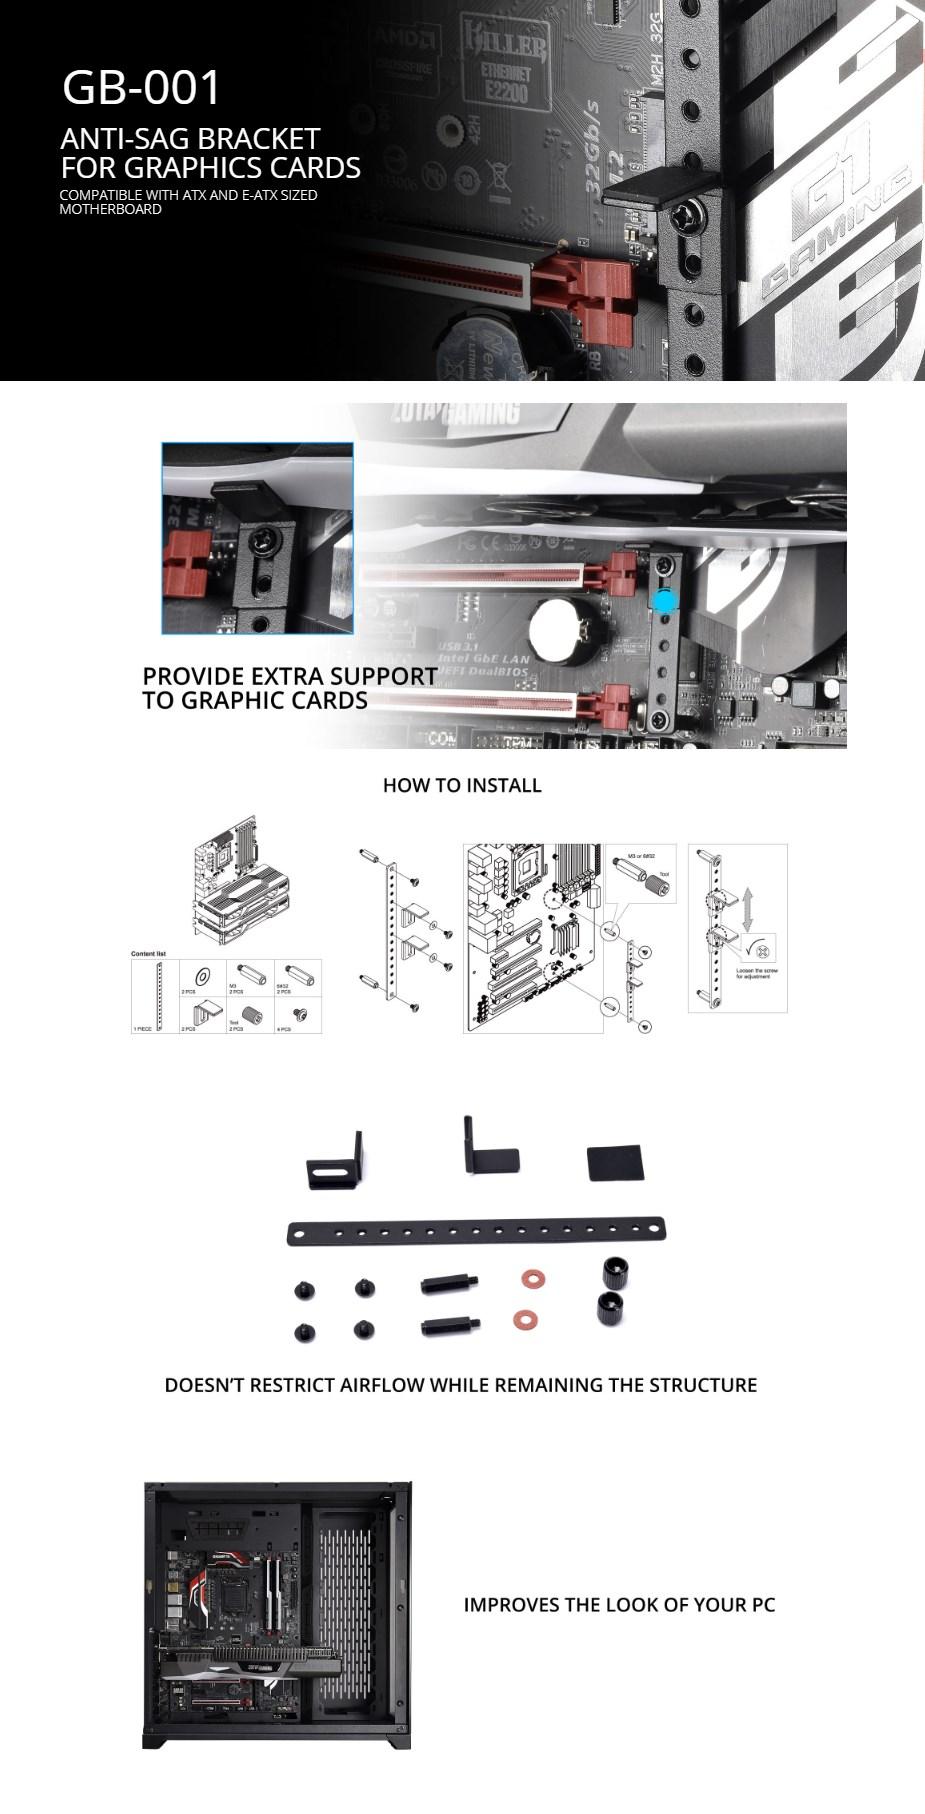 Lian-Li GB-001X Anti-Sag Graphics Cards Bracket - Black - Overview 1